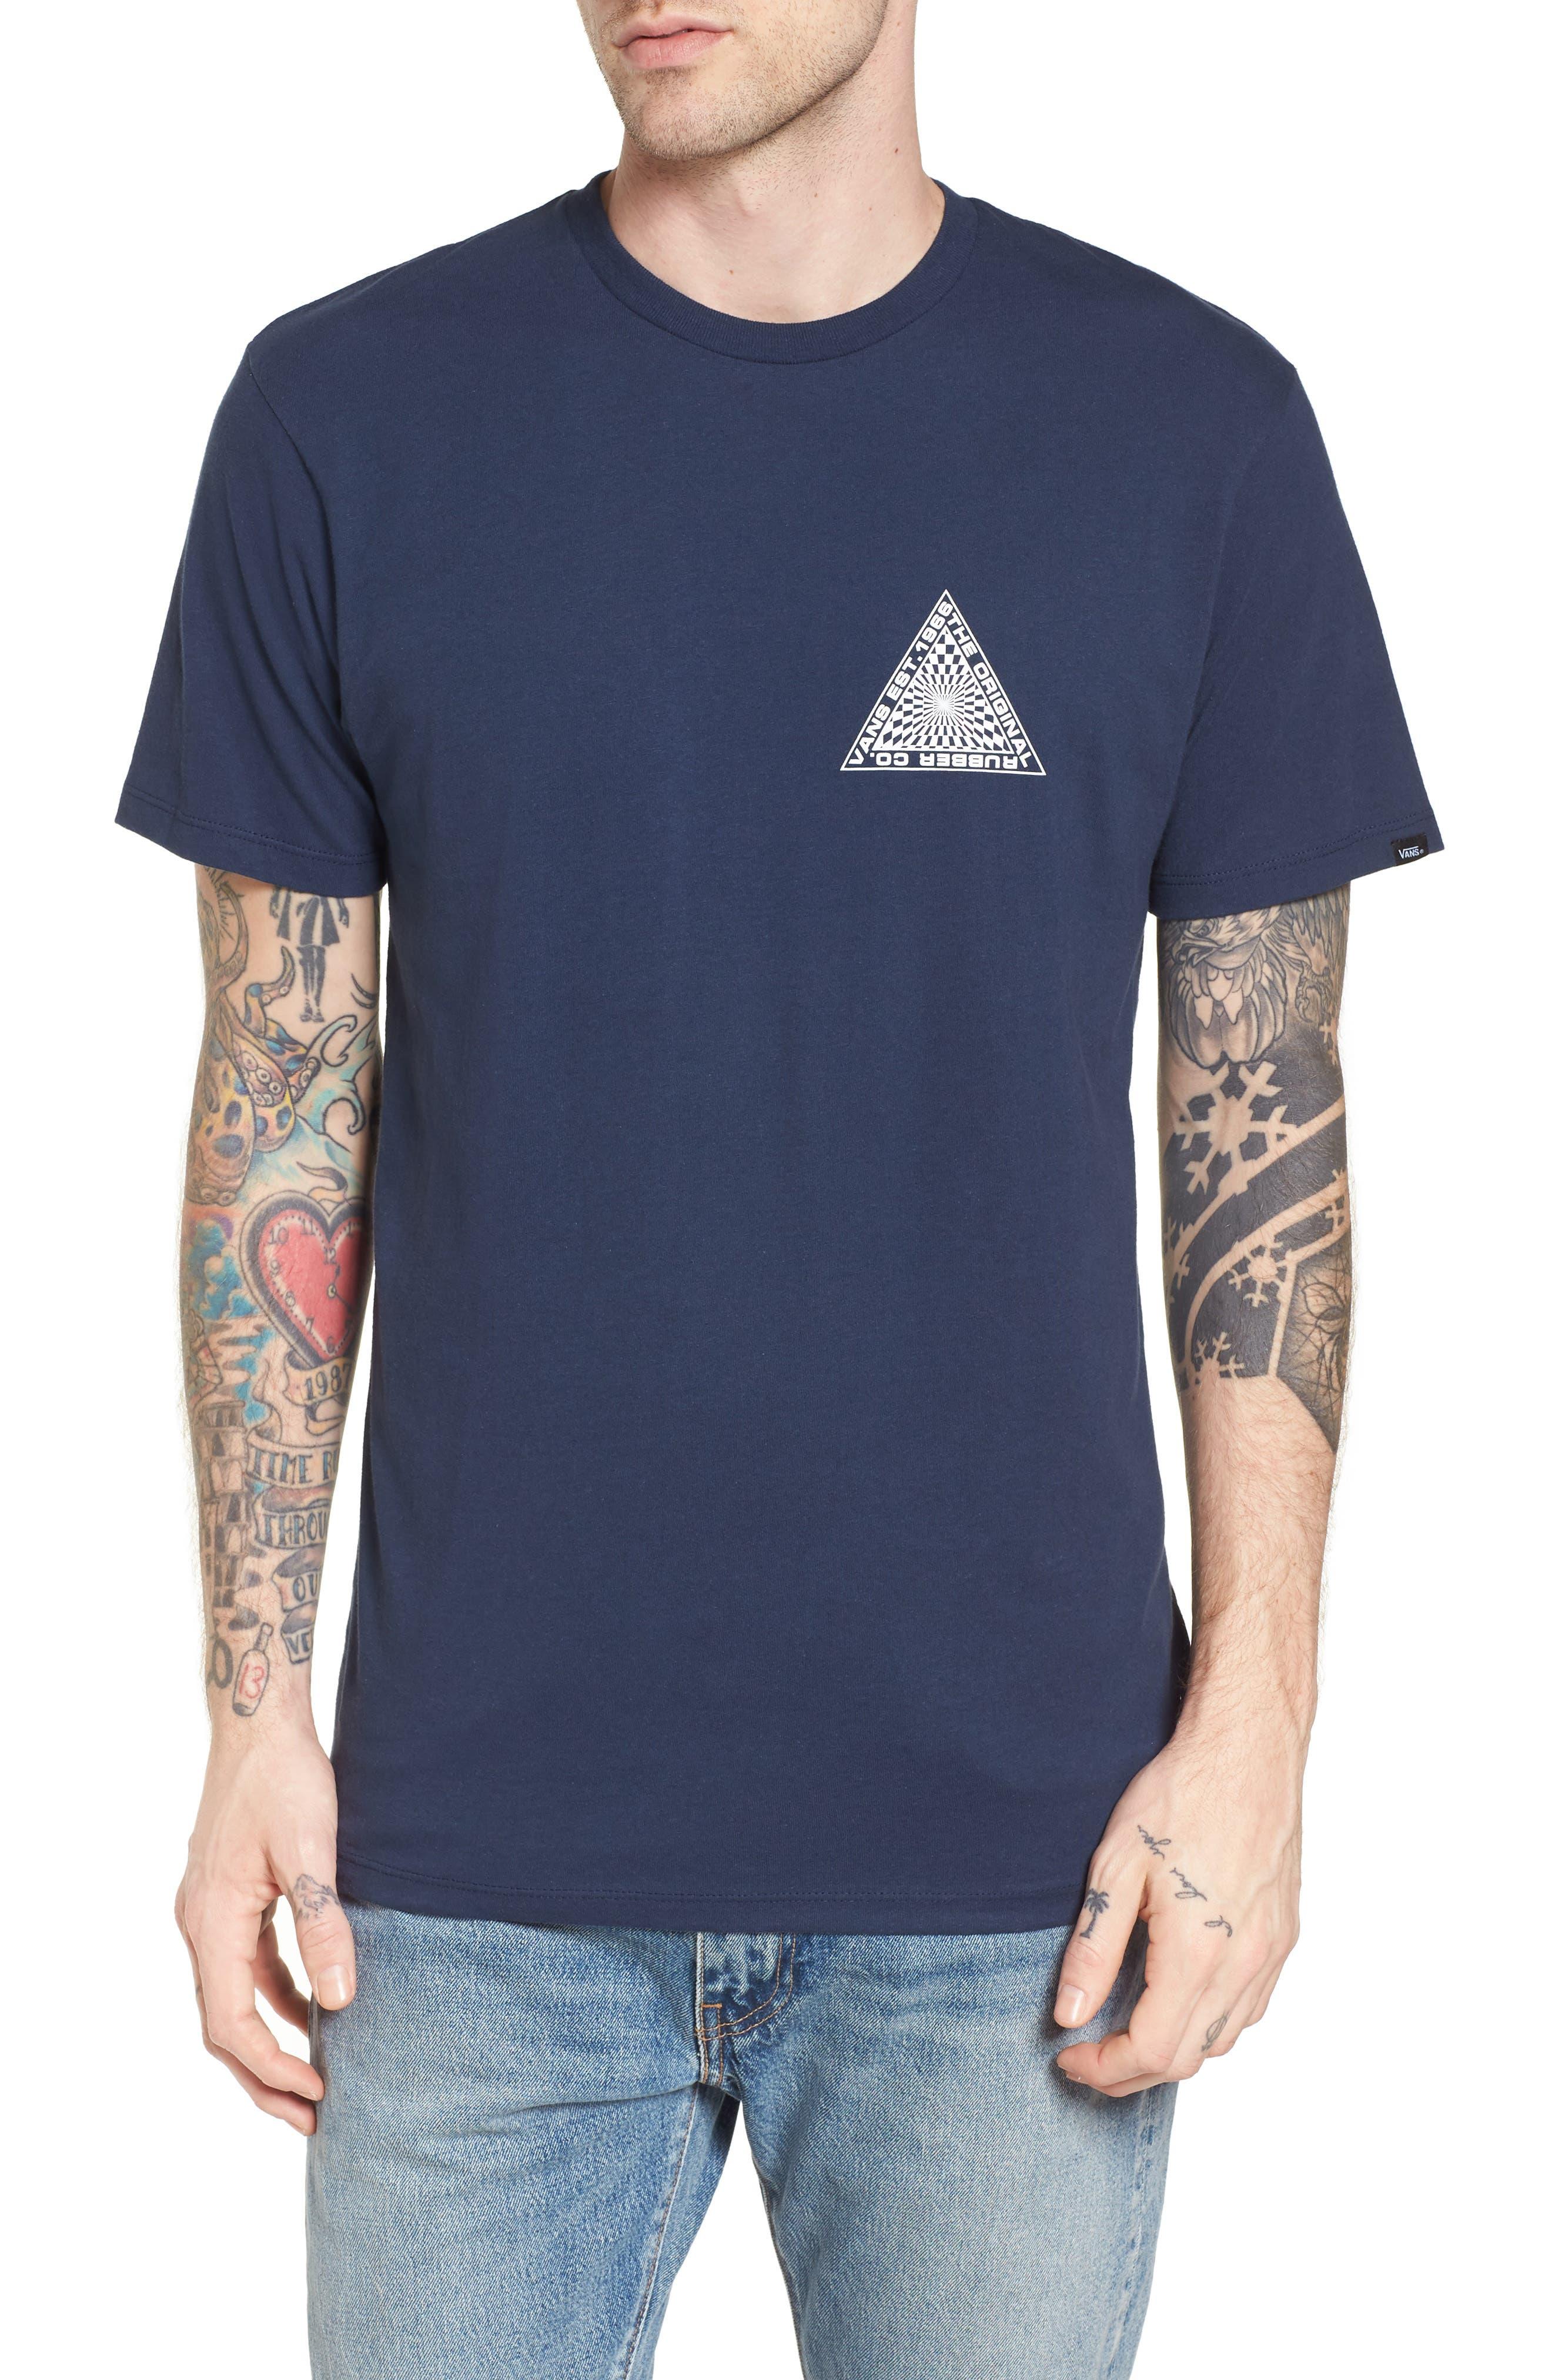 Hypnotics T-Shirt,                             Main thumbnail 1, color,                             401